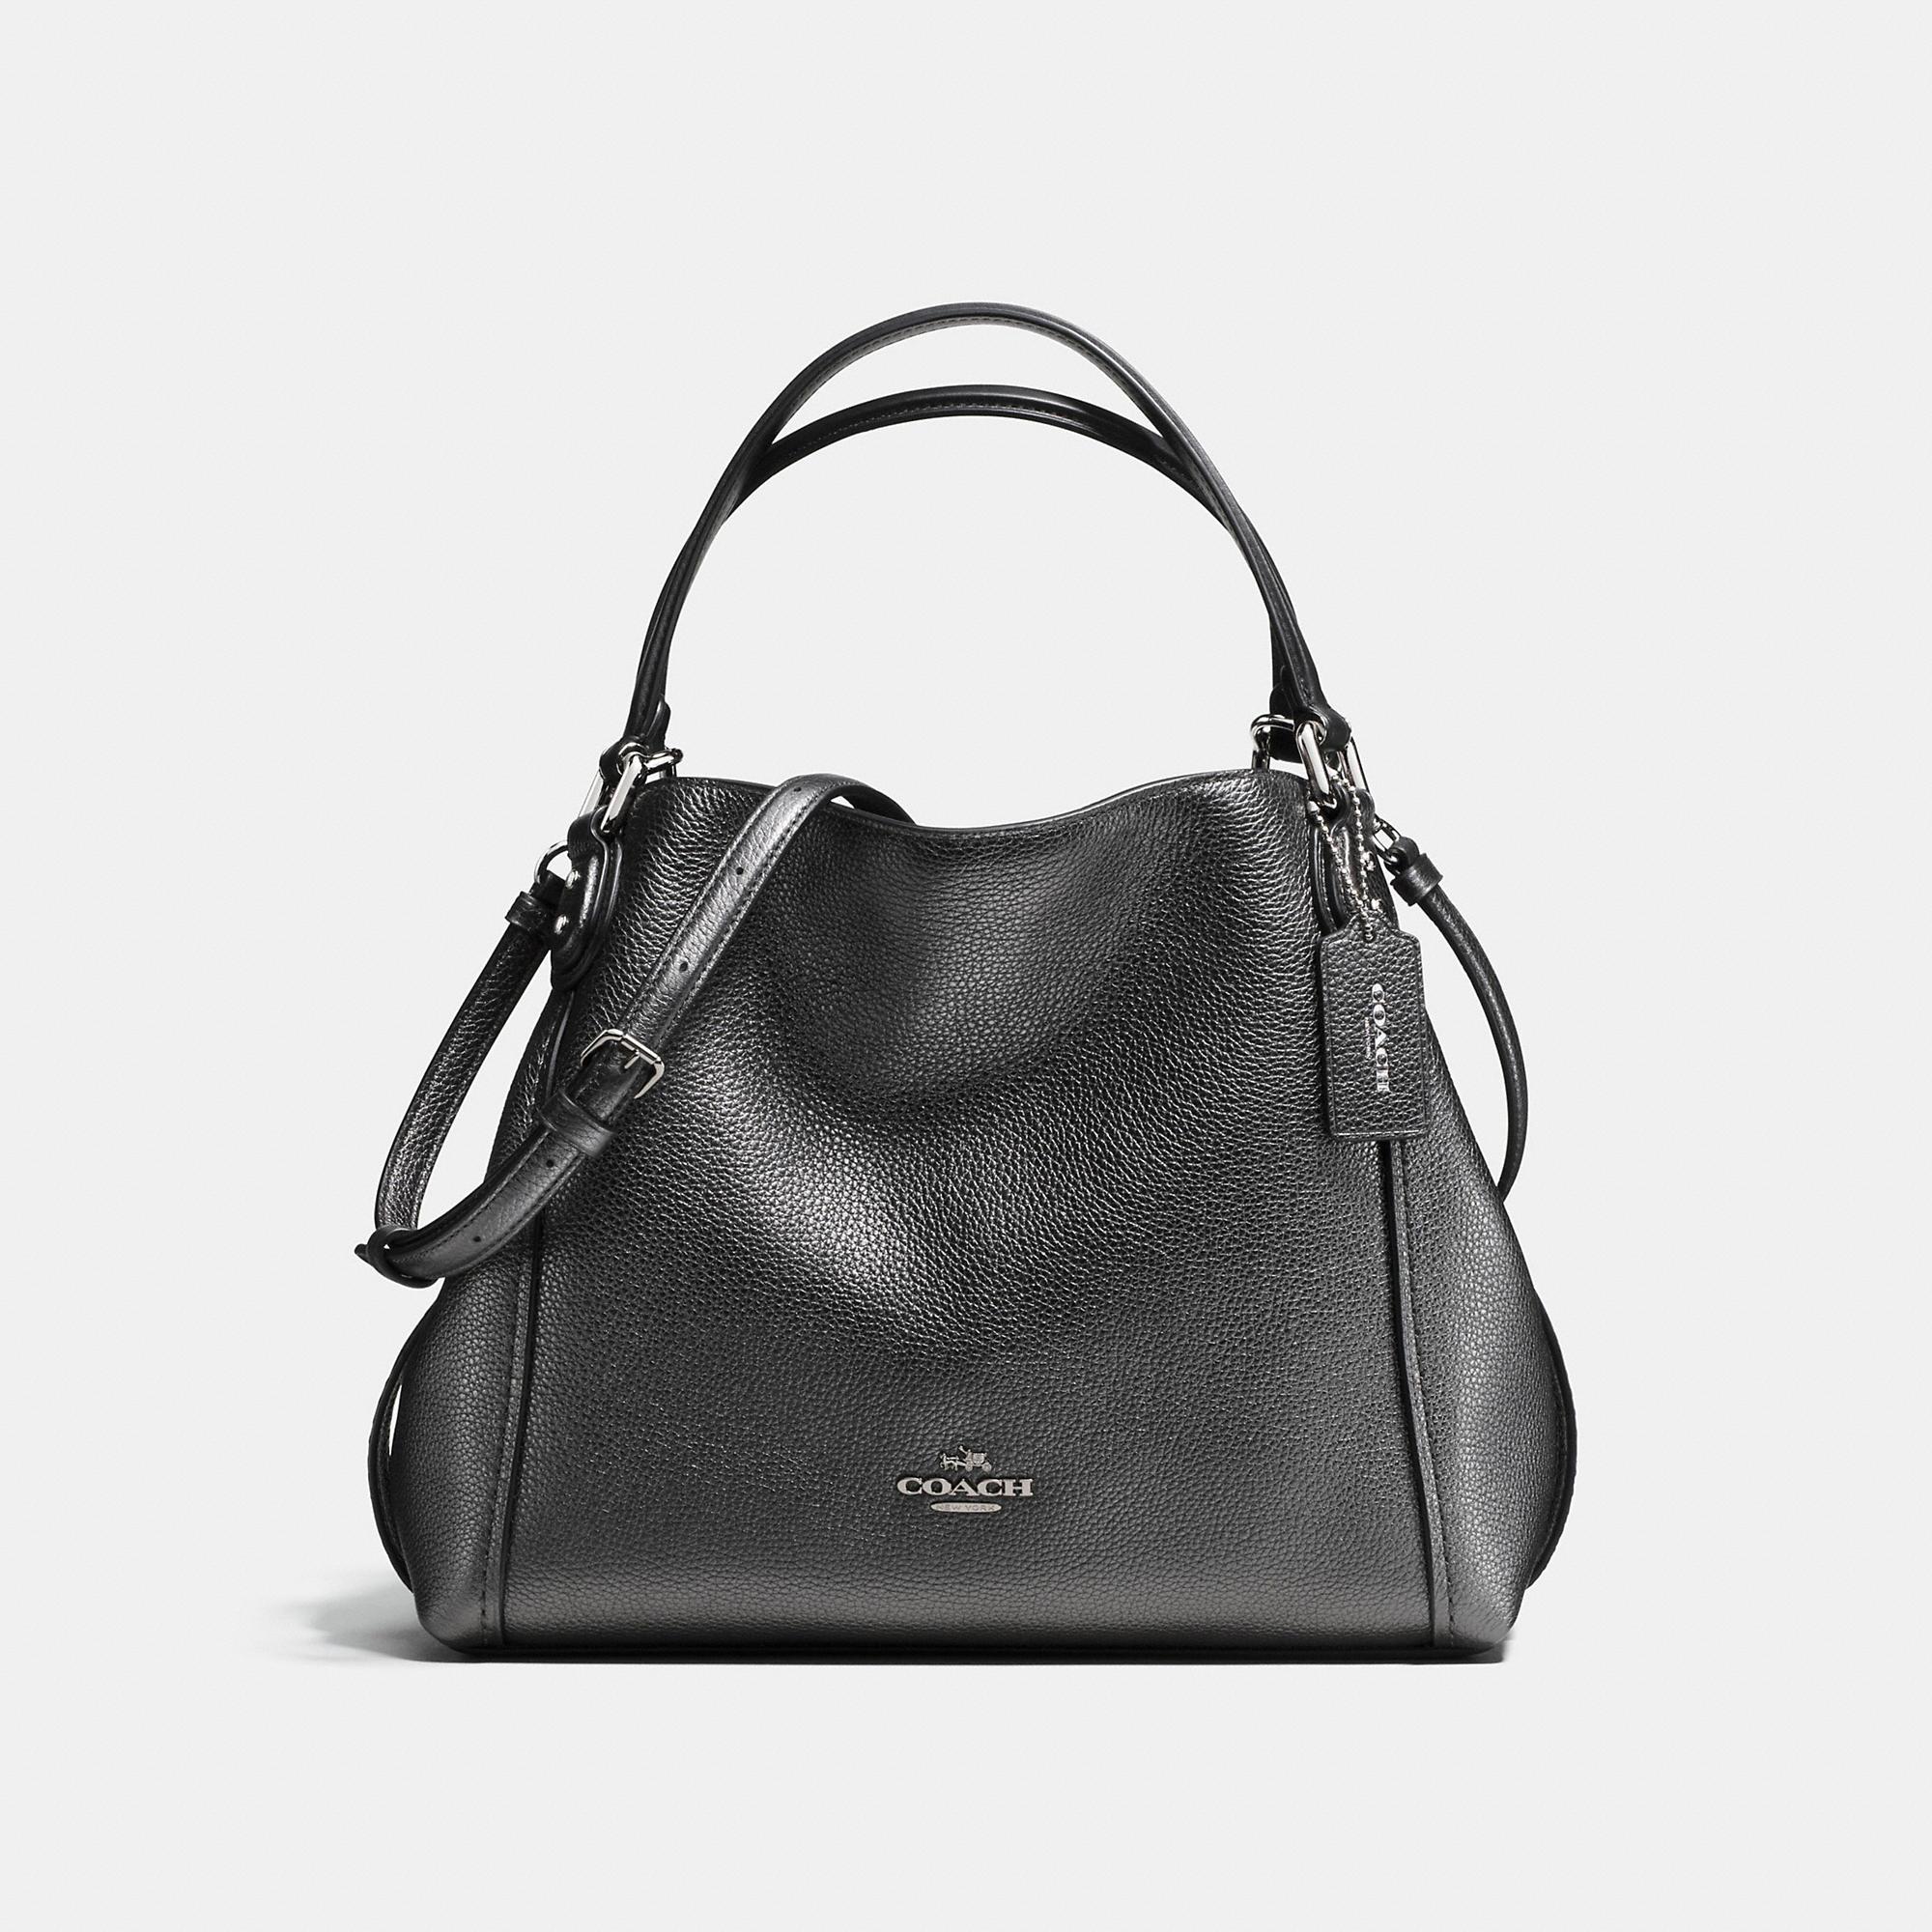 Coach Edie Shoulder Bag 28 In Metallic Leather